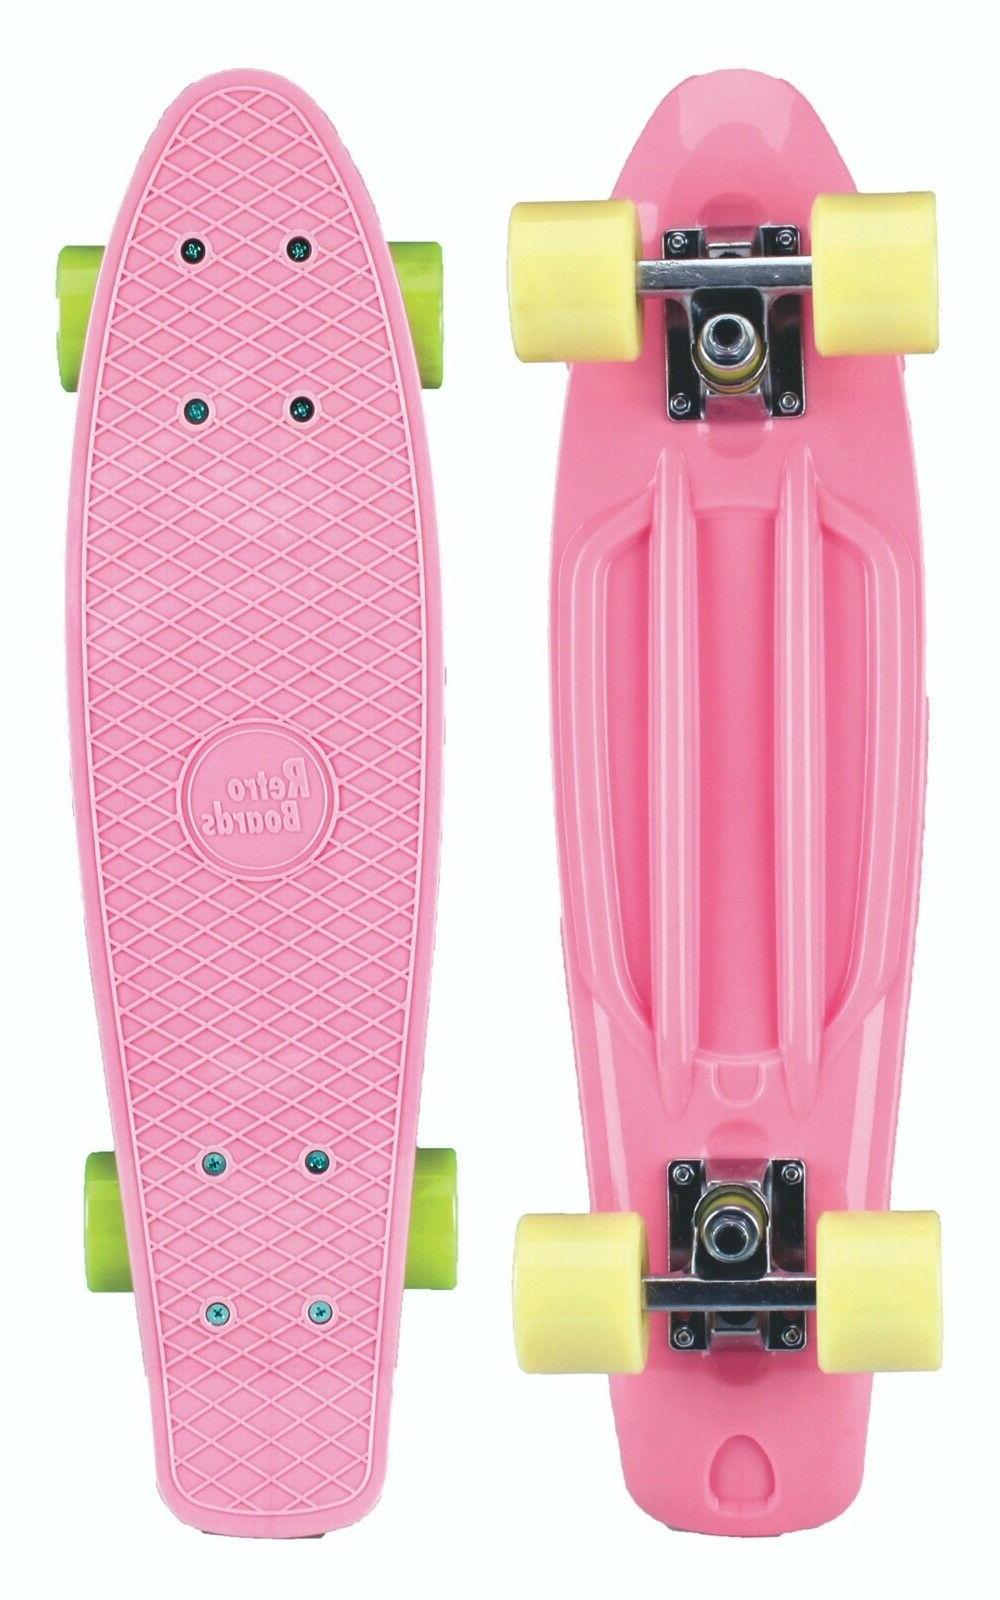 brand new pennyboard replica 22